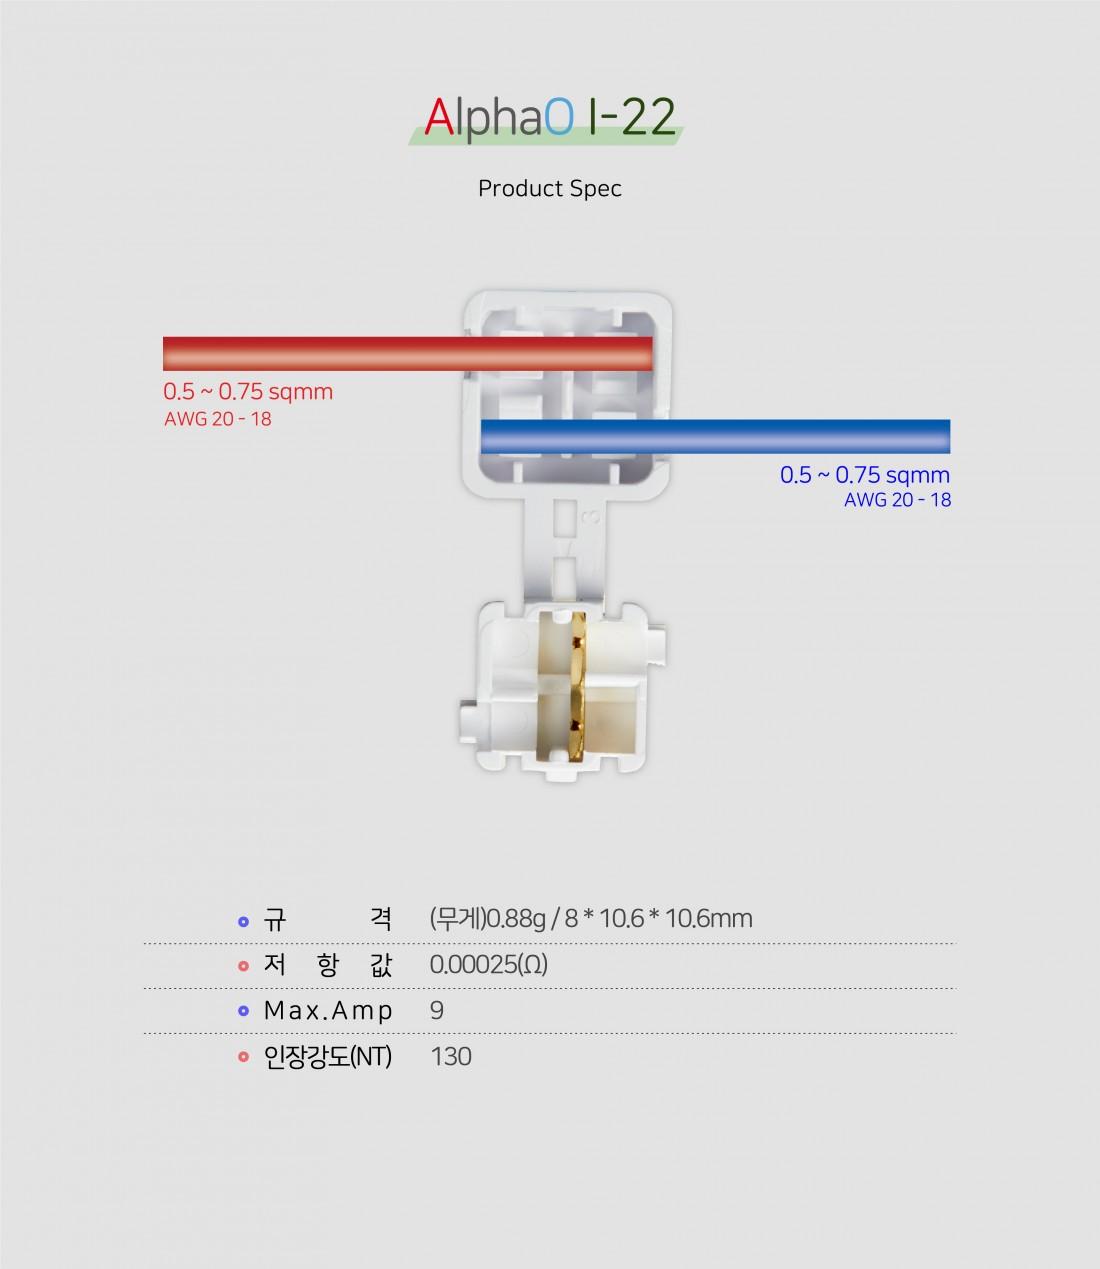 7cfa252c996ab89f9d26d54f94d6349d_1626398481_63.jpg